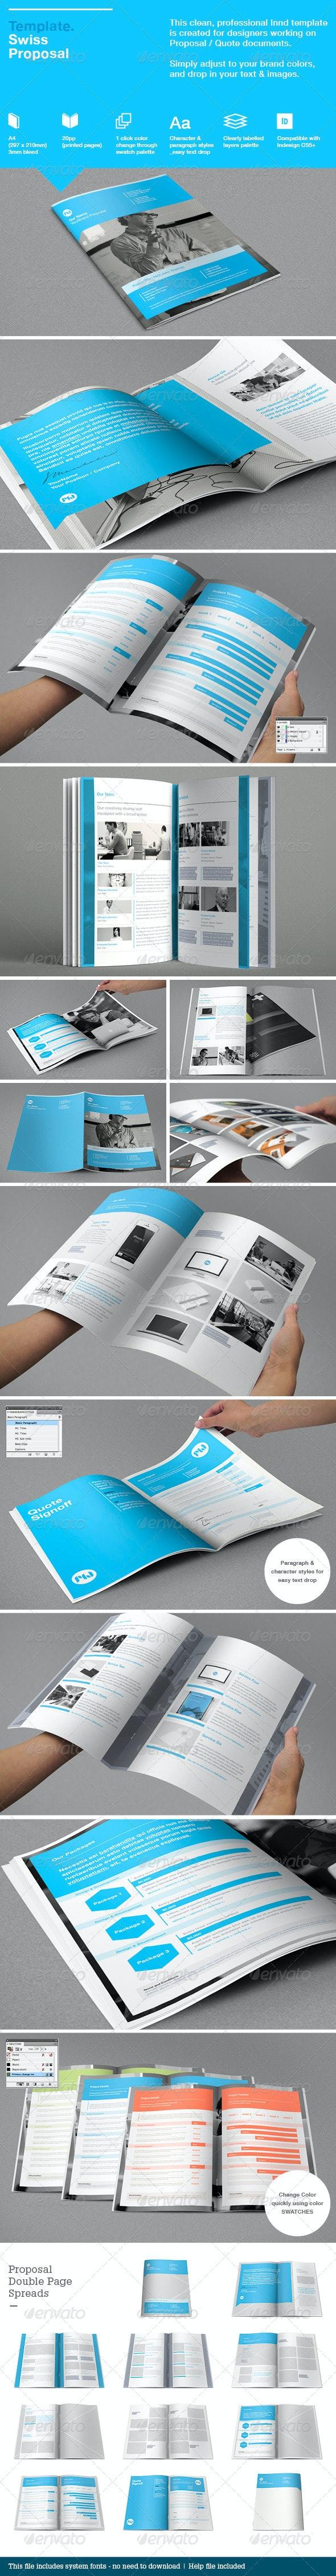 Swiss Proposal Template - Brochures Print Templates